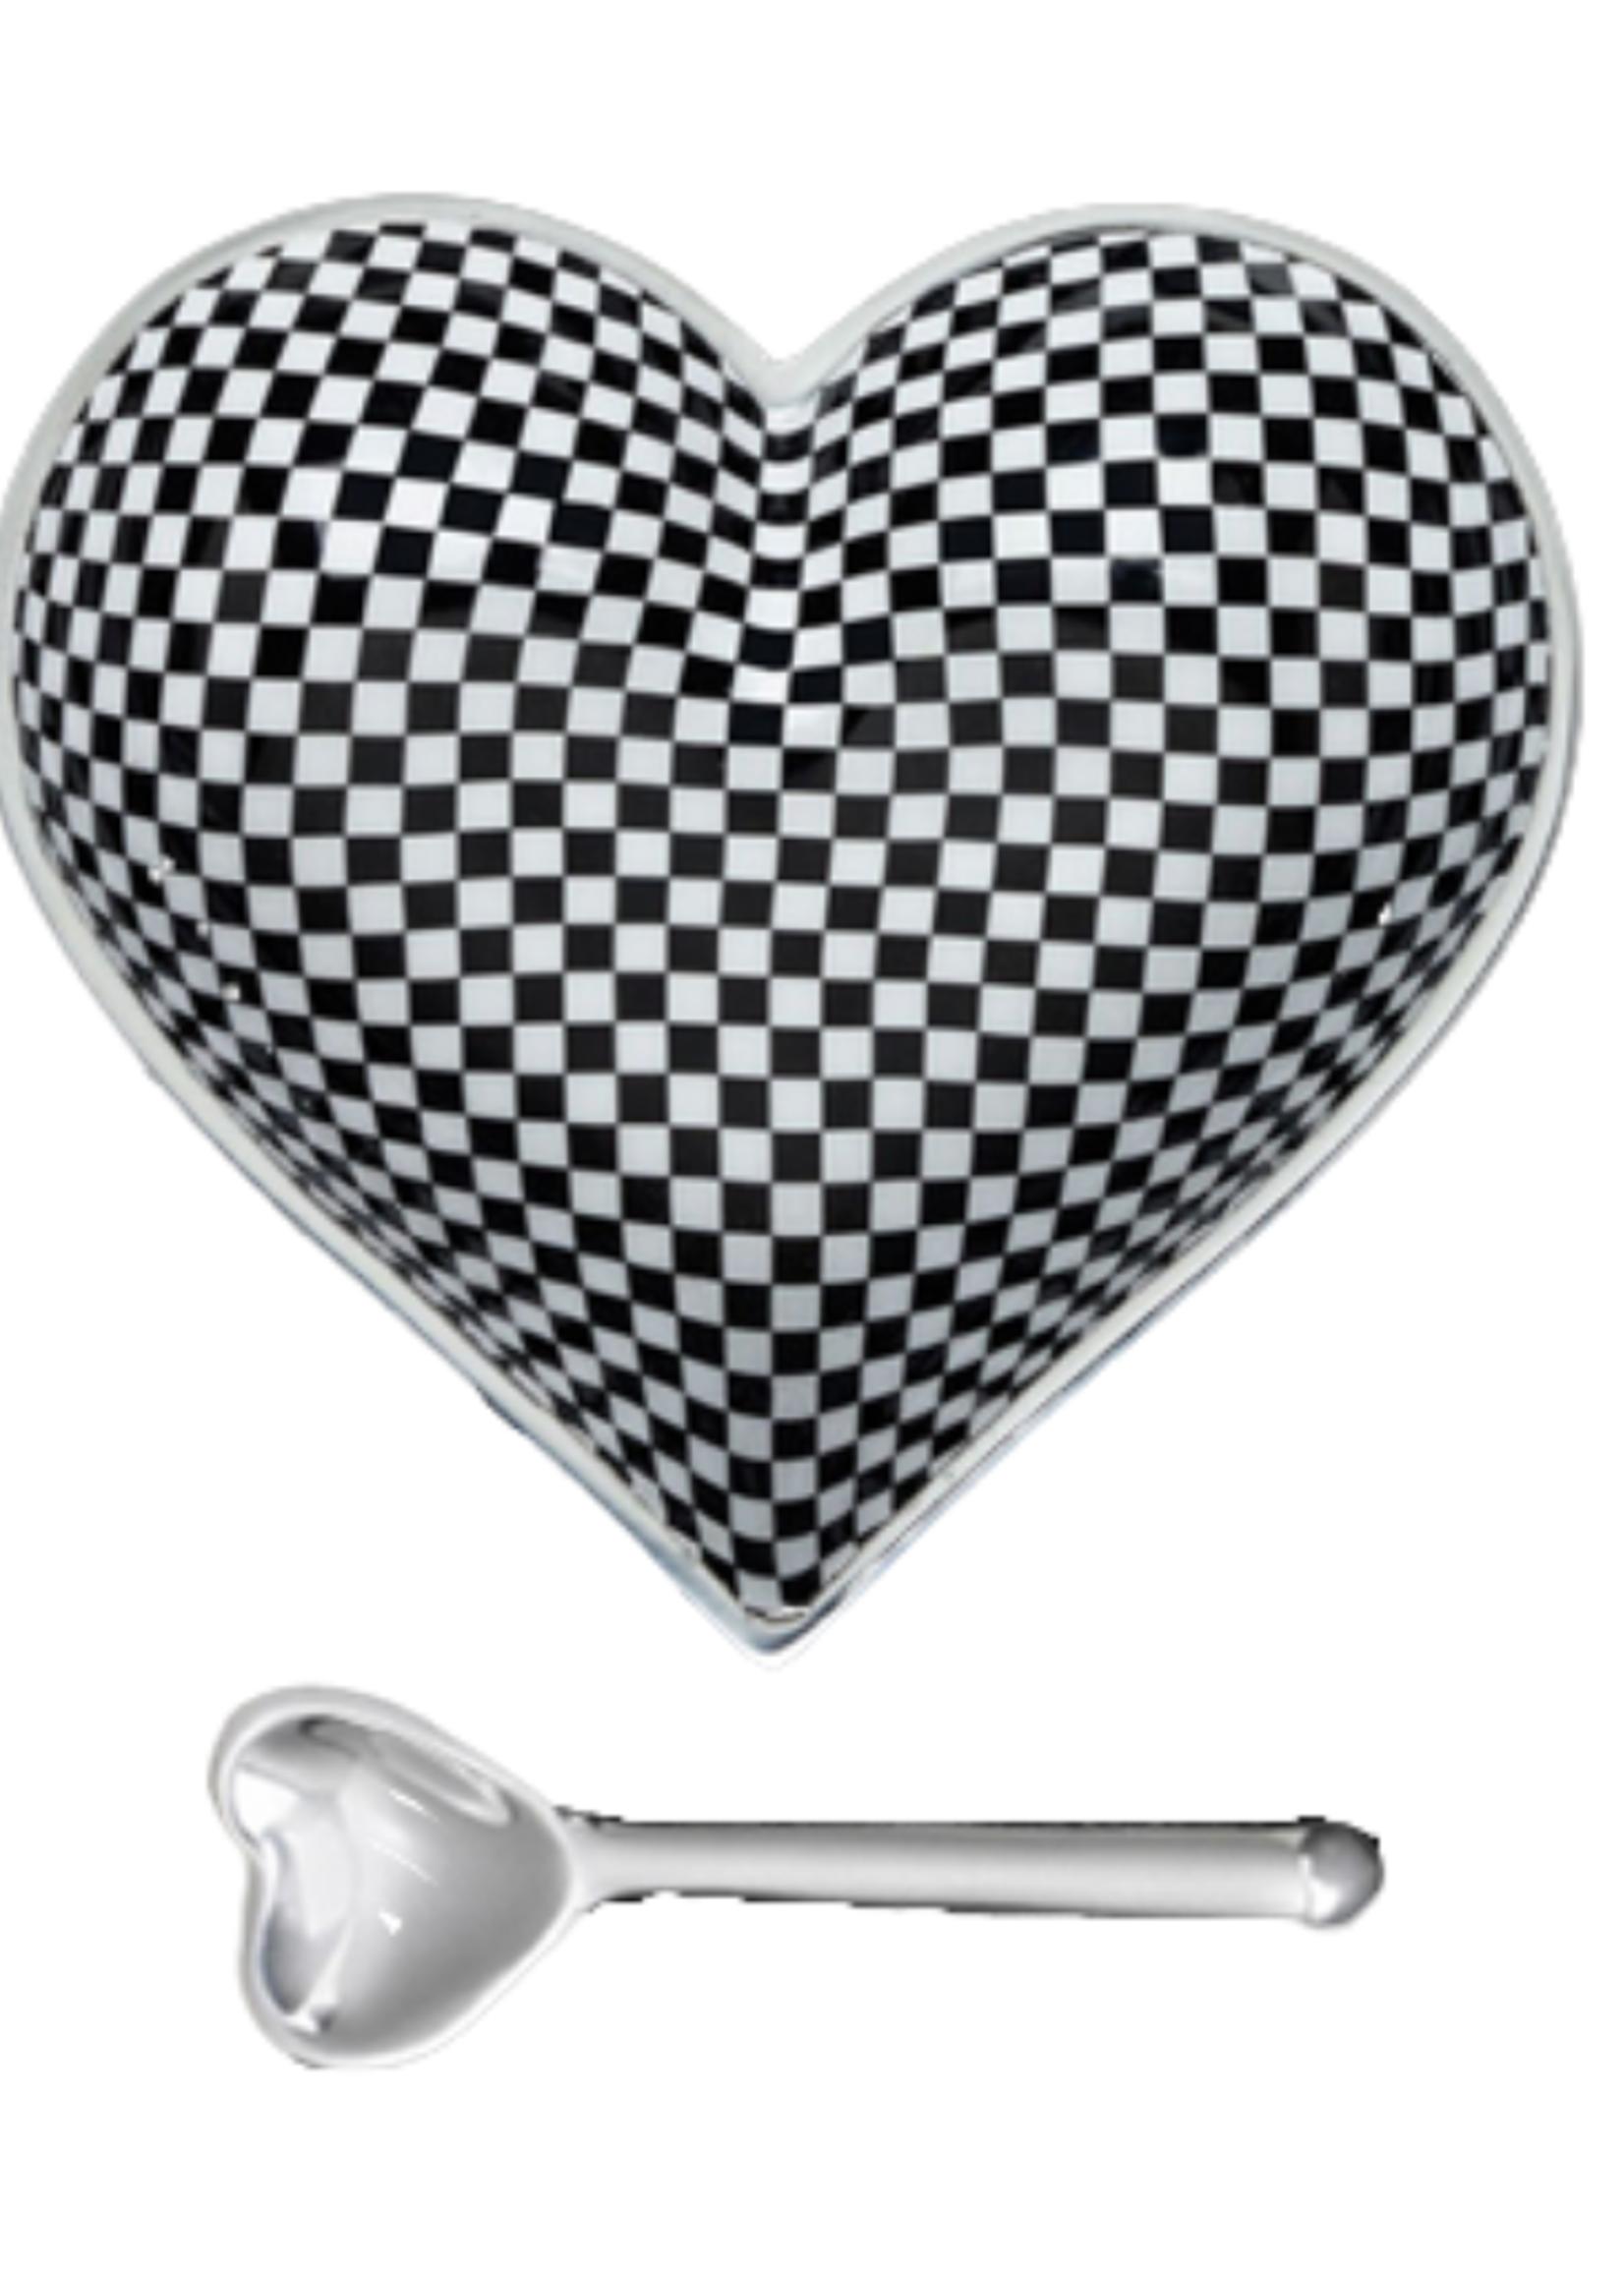 Happy Heart Bowl w Spoon // Checkerboard